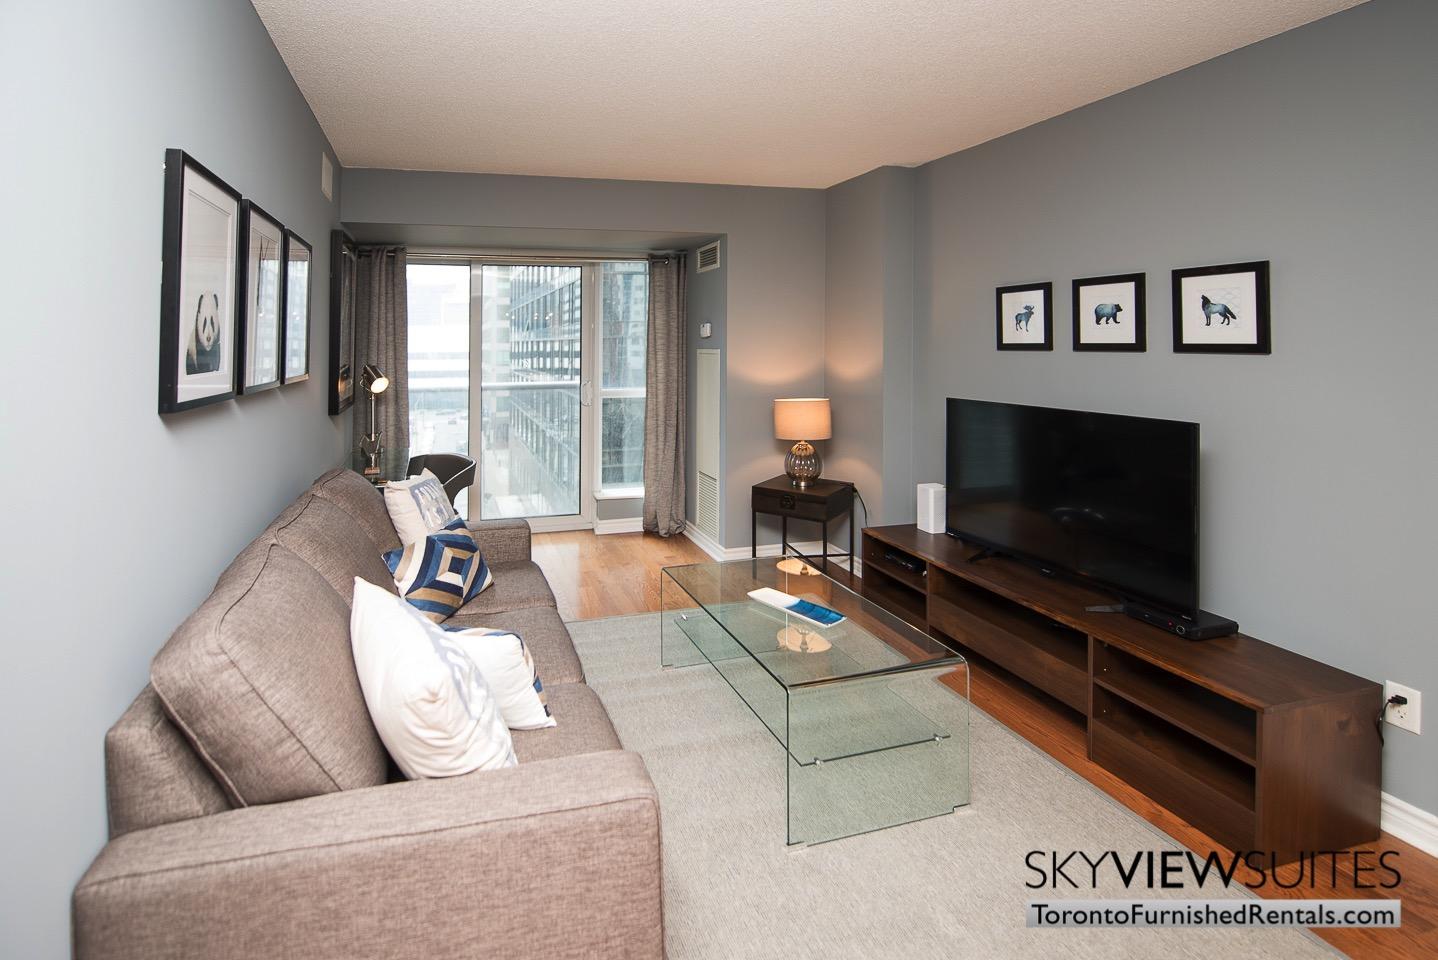 Wellington and Blue Jays Way executive rentals toronto living room pillows and tv set